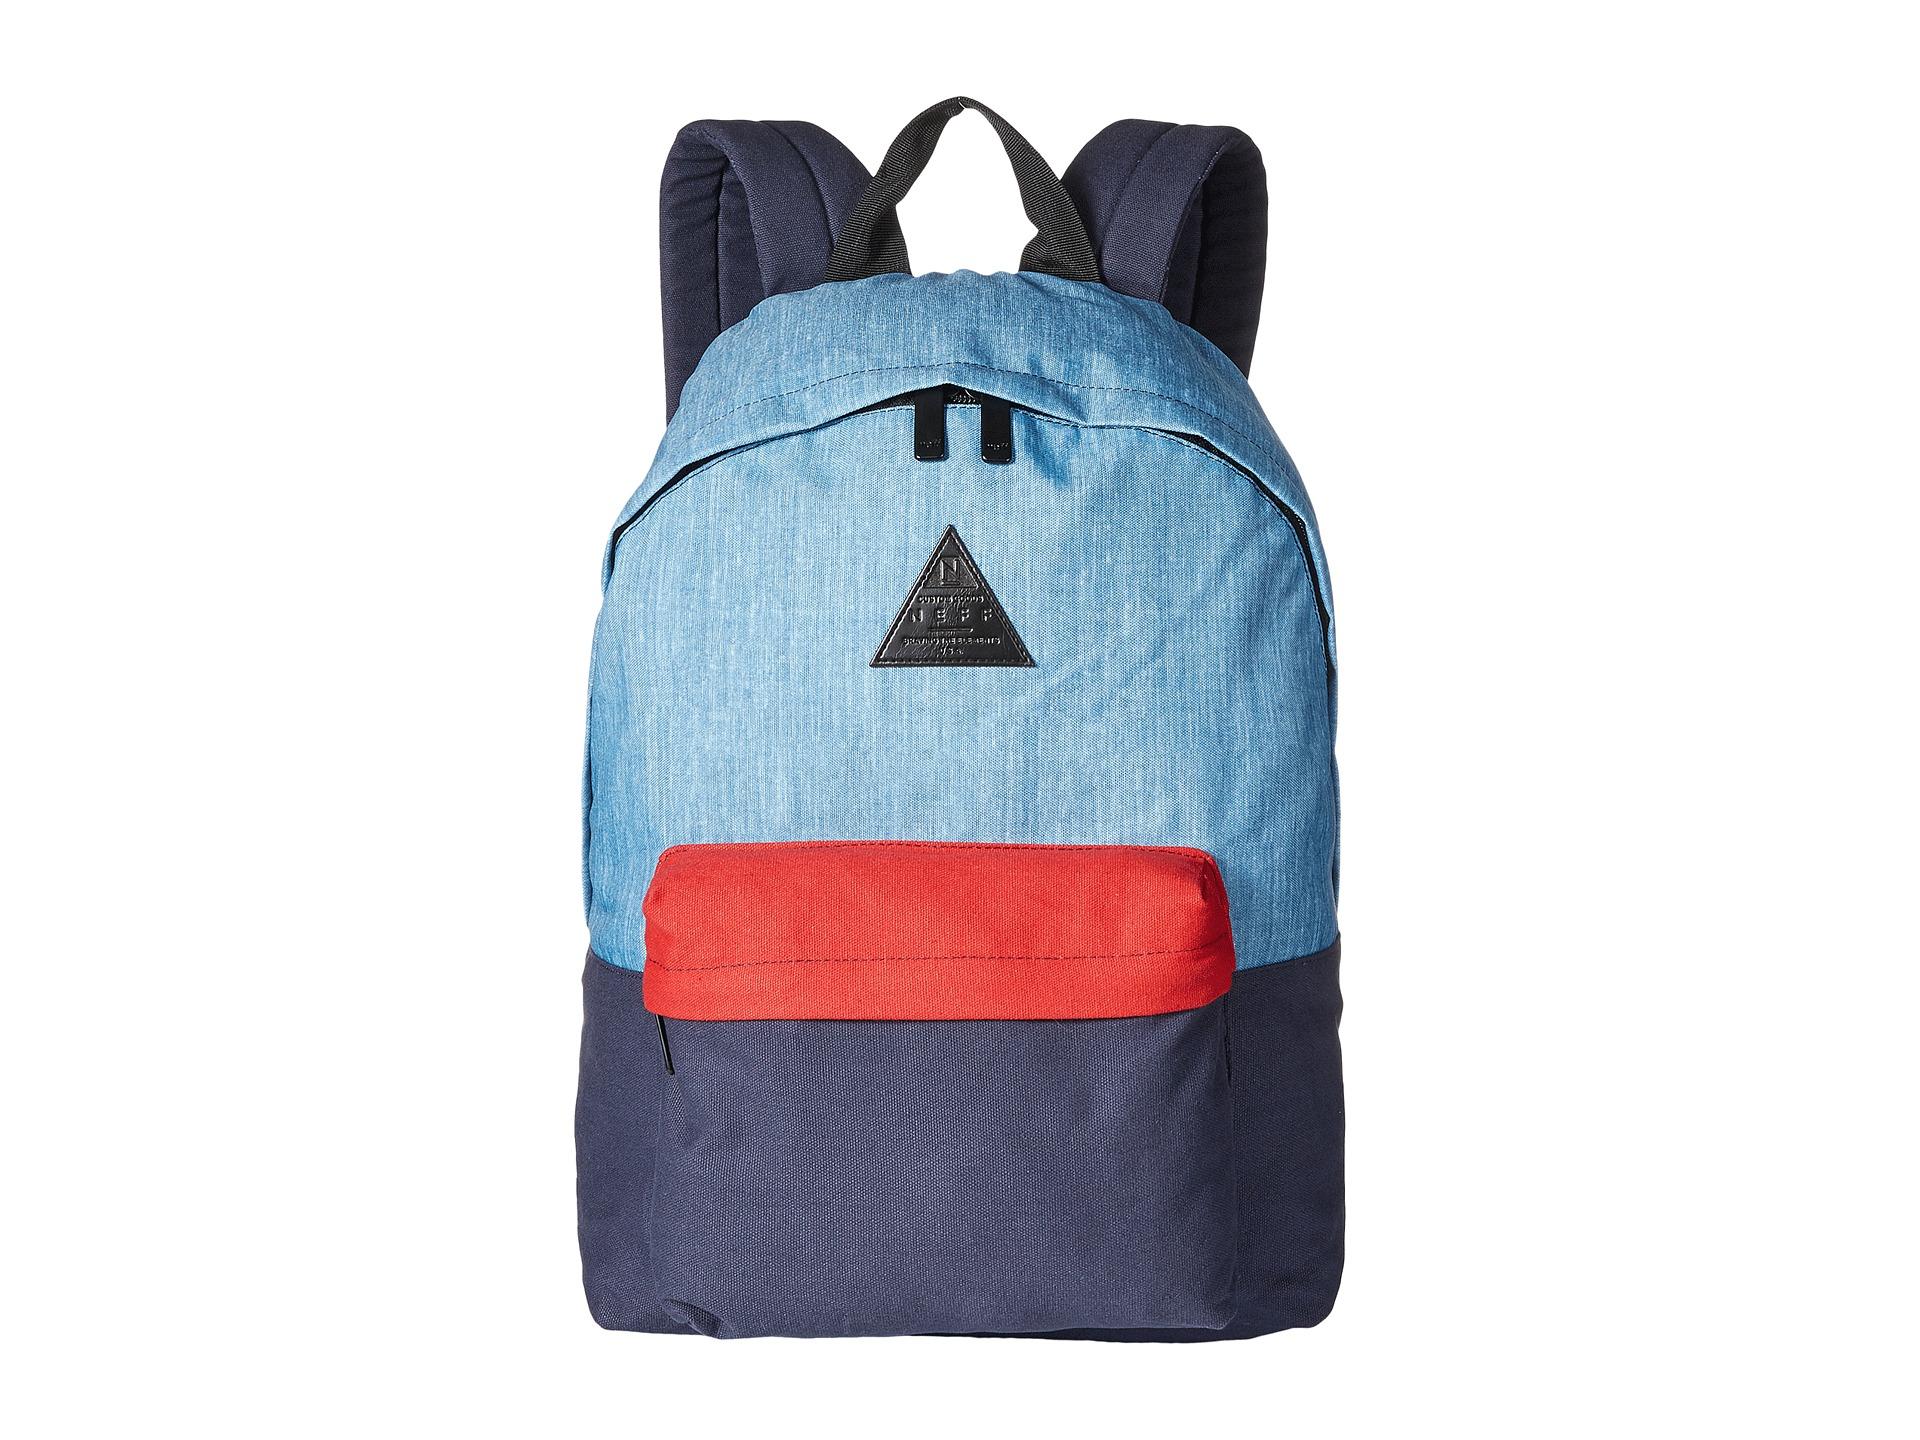 52cf0b50530 Lyst - Neff Professor Backpack in Blue for Men